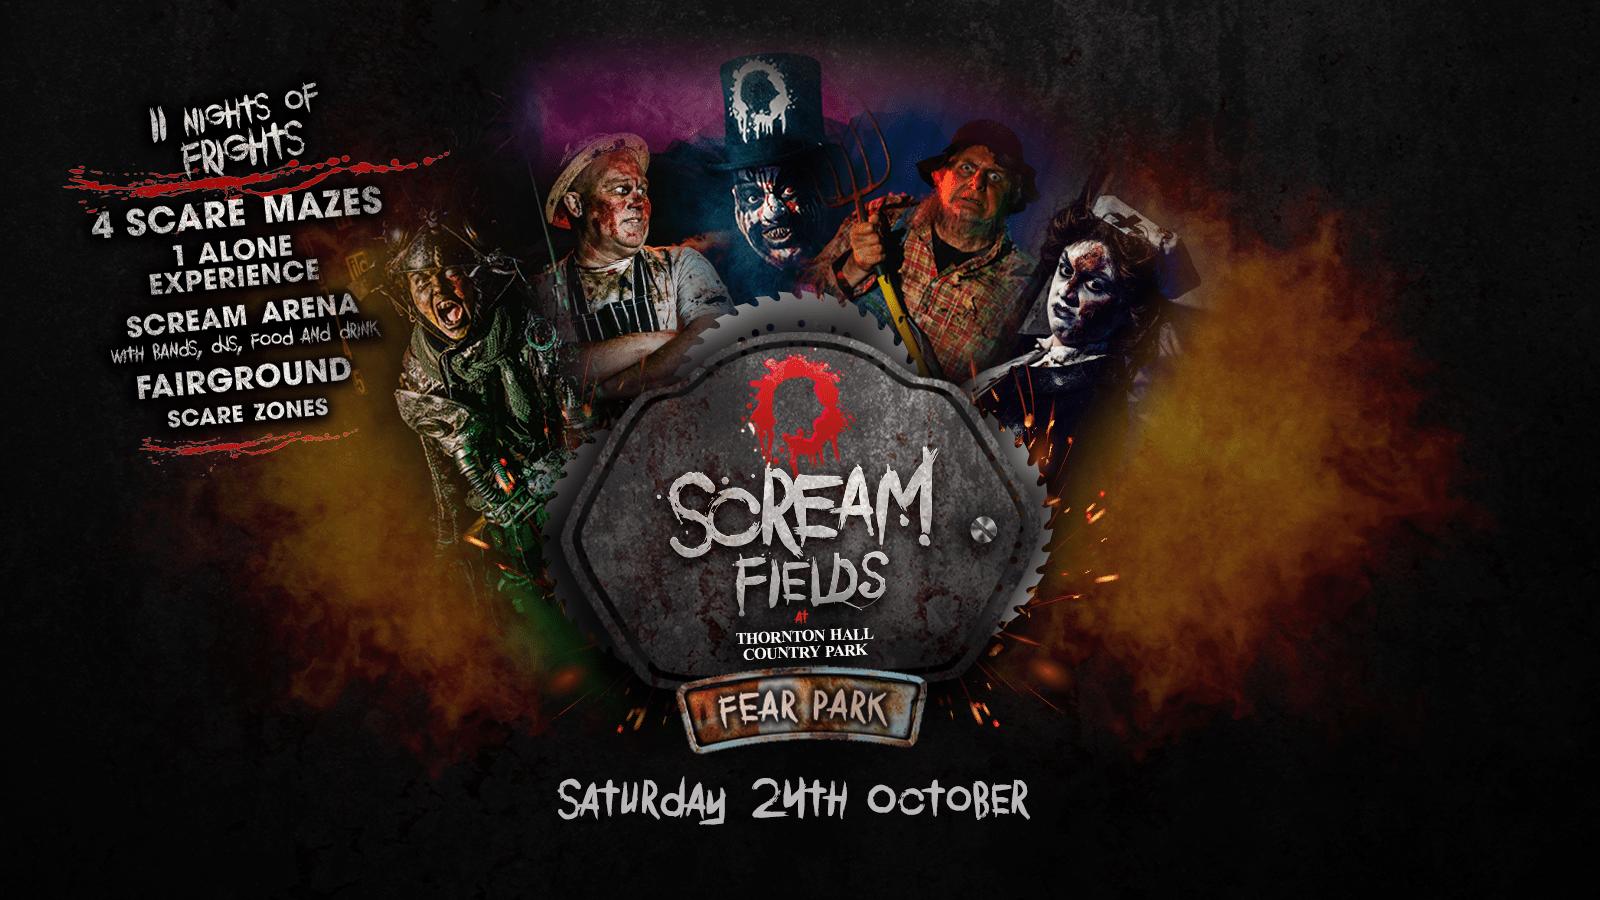 6.00PM – Screamfields: Saturday 24th October 2020